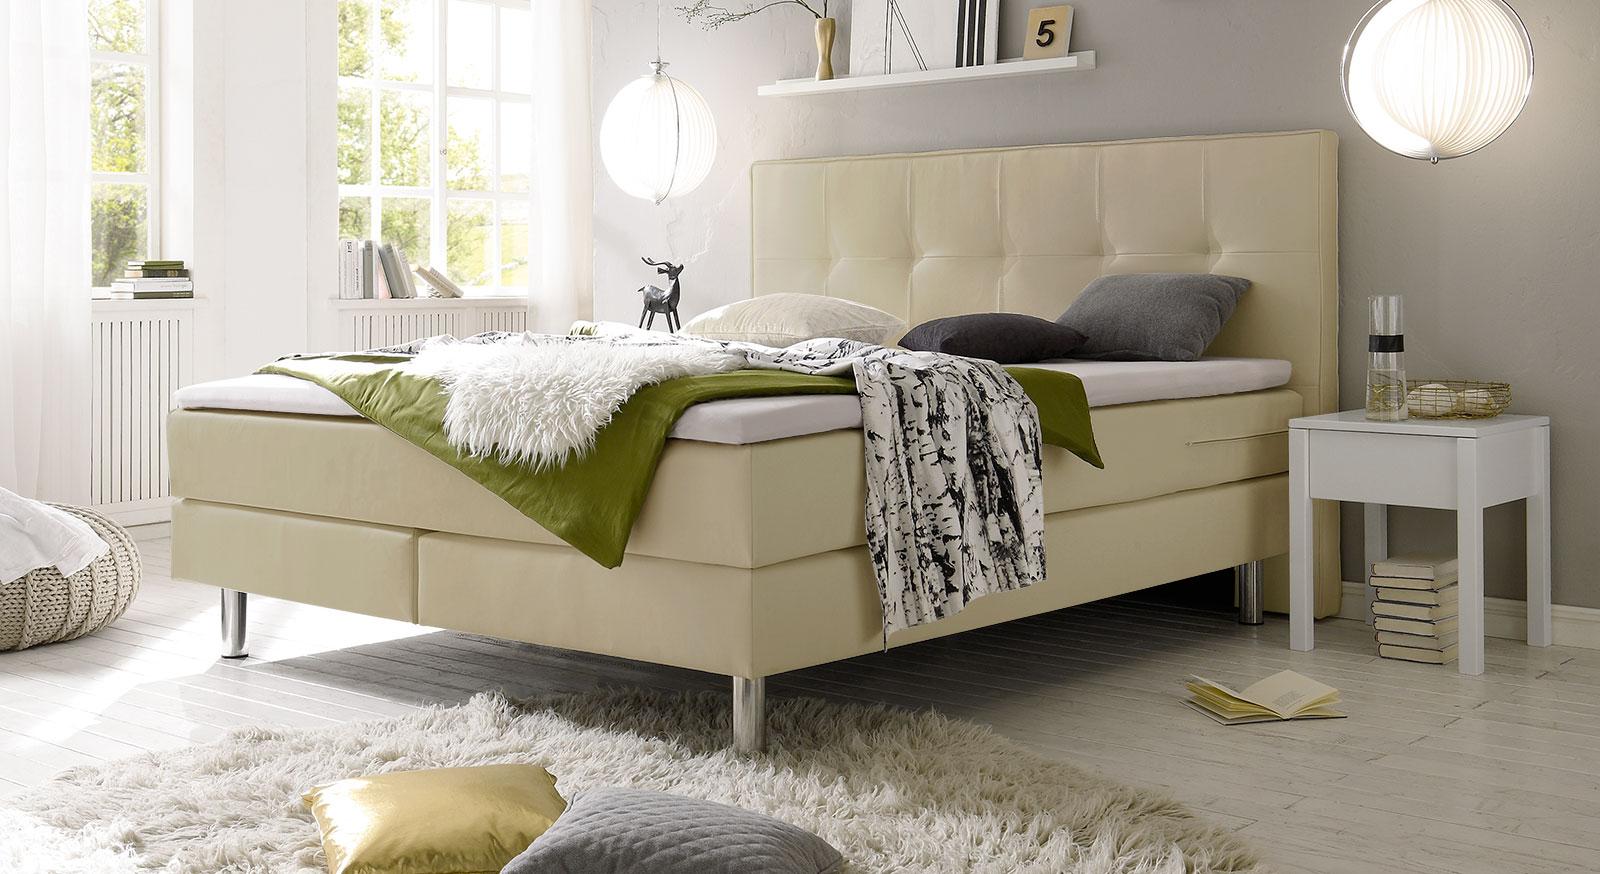 boxspringbett mit schneller lieferzeit inklusive topper berea. Black Bedroom Furniture Sets. Home Design Ideas